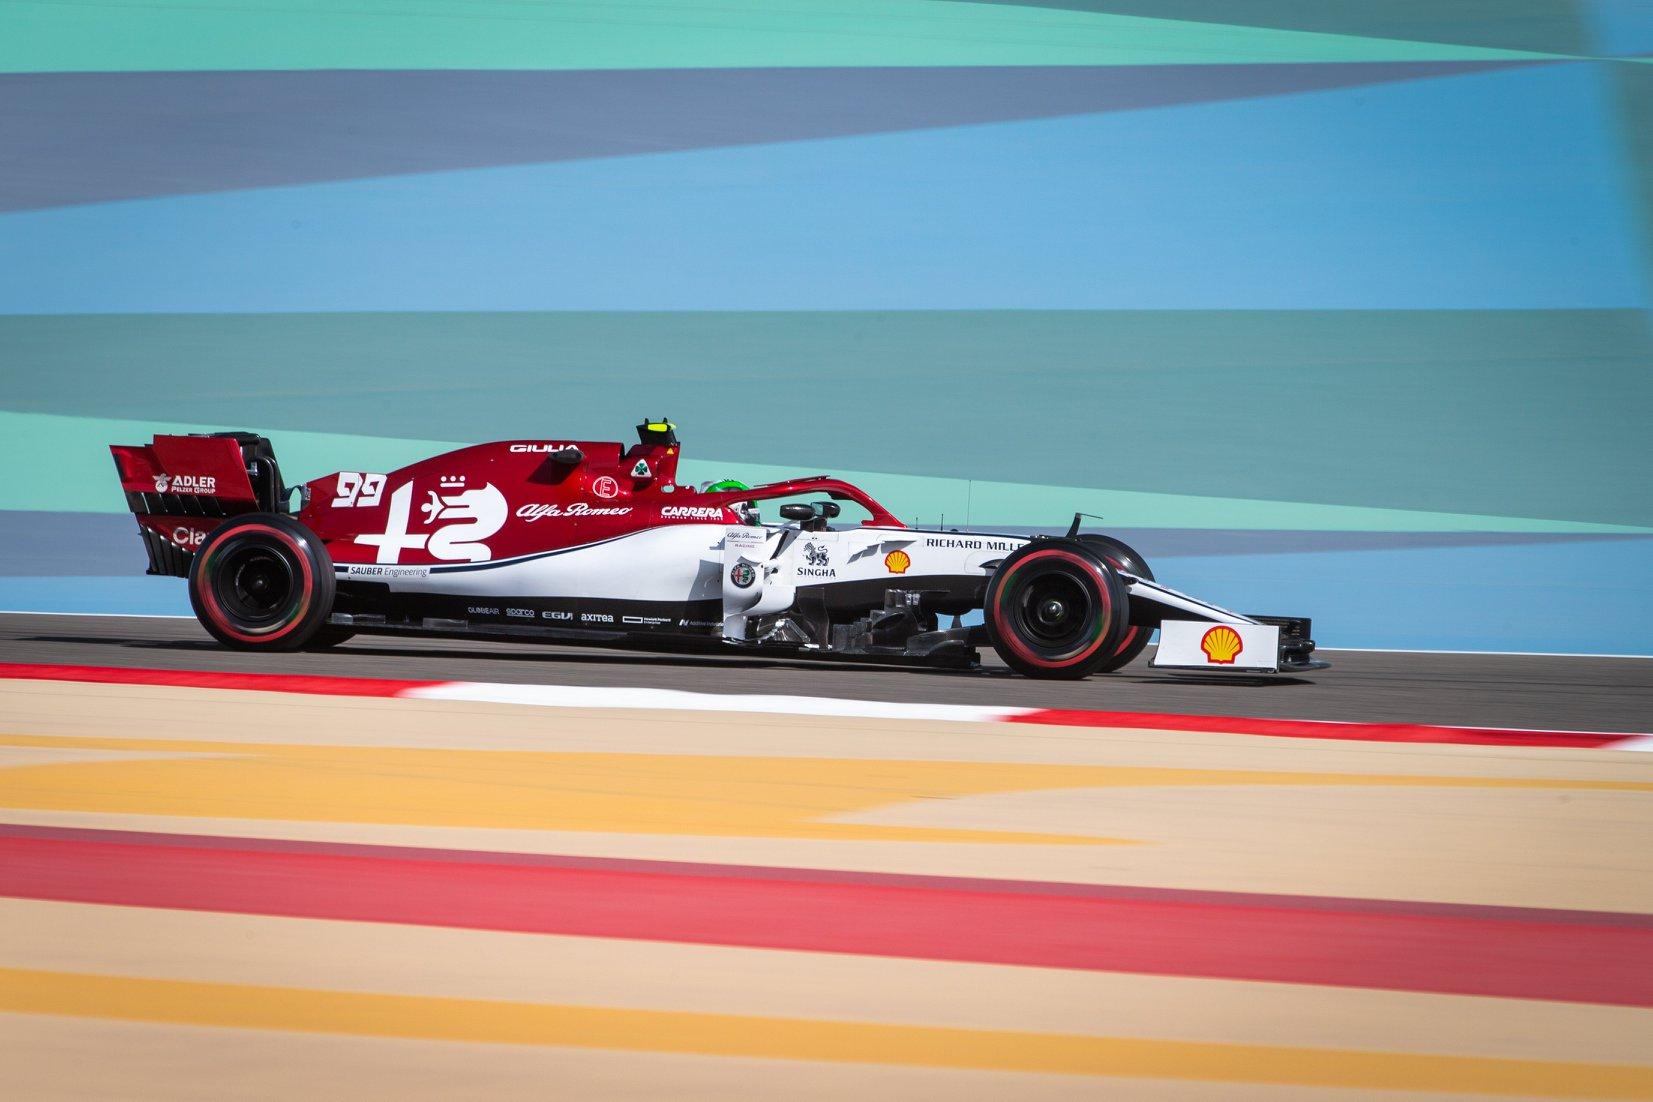 2019 Bahrain Grand Prix Live Stream